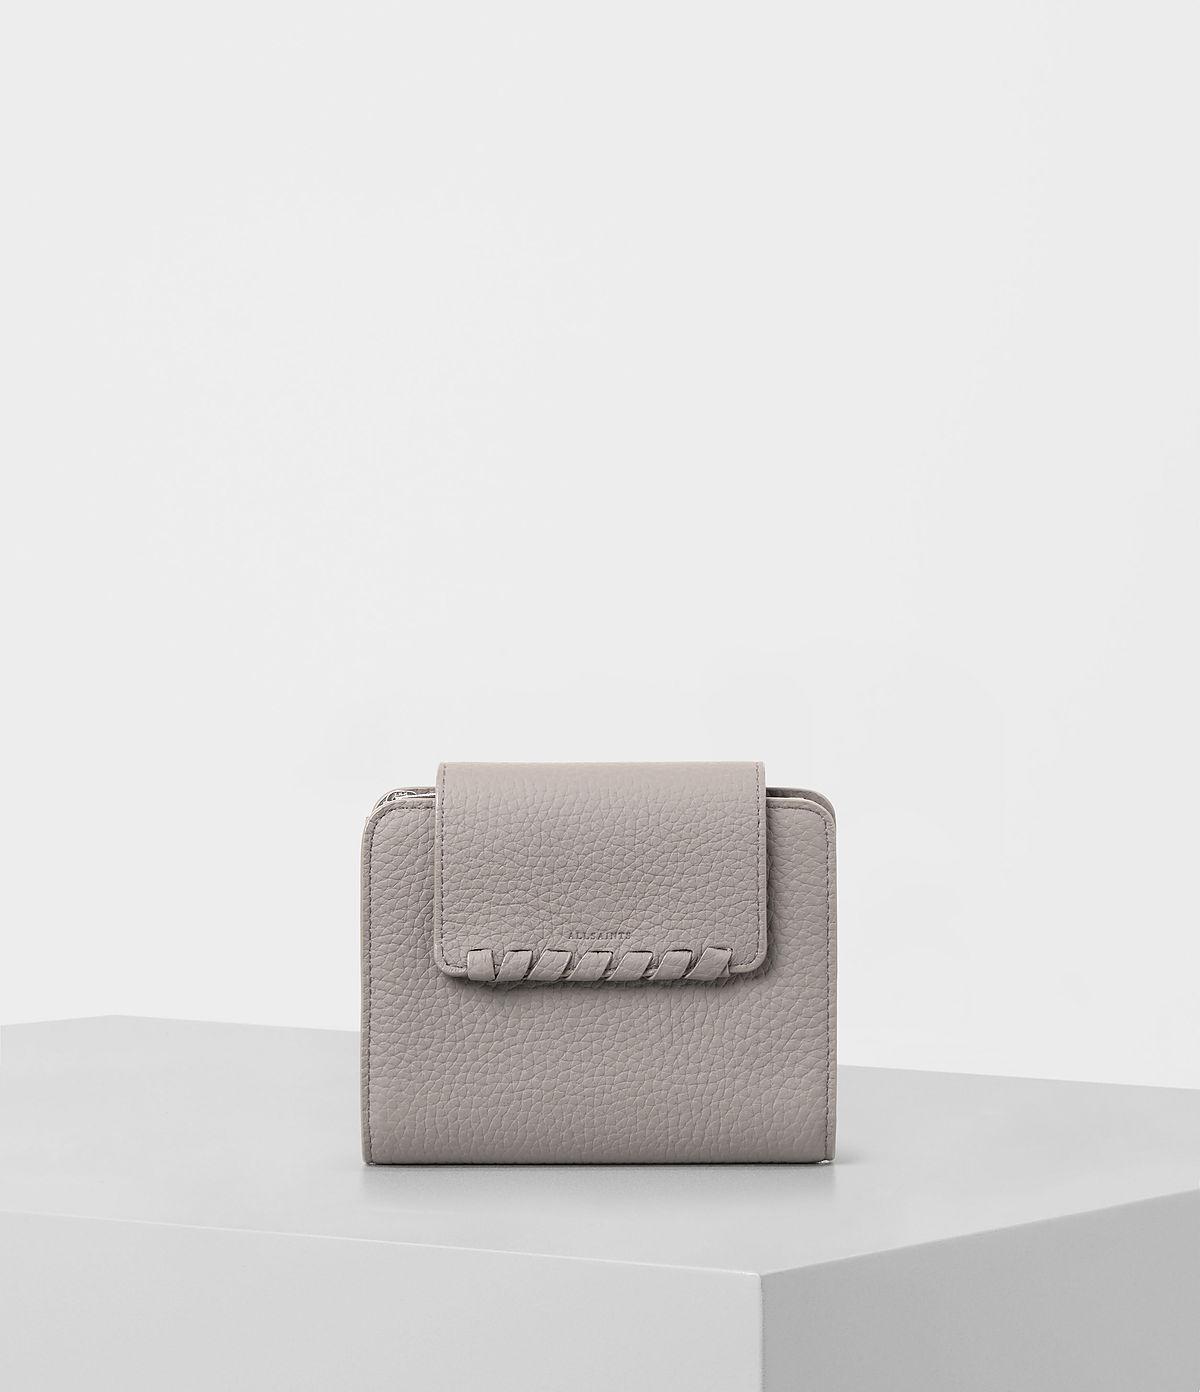 kita-mini-japanese-leather-wallet